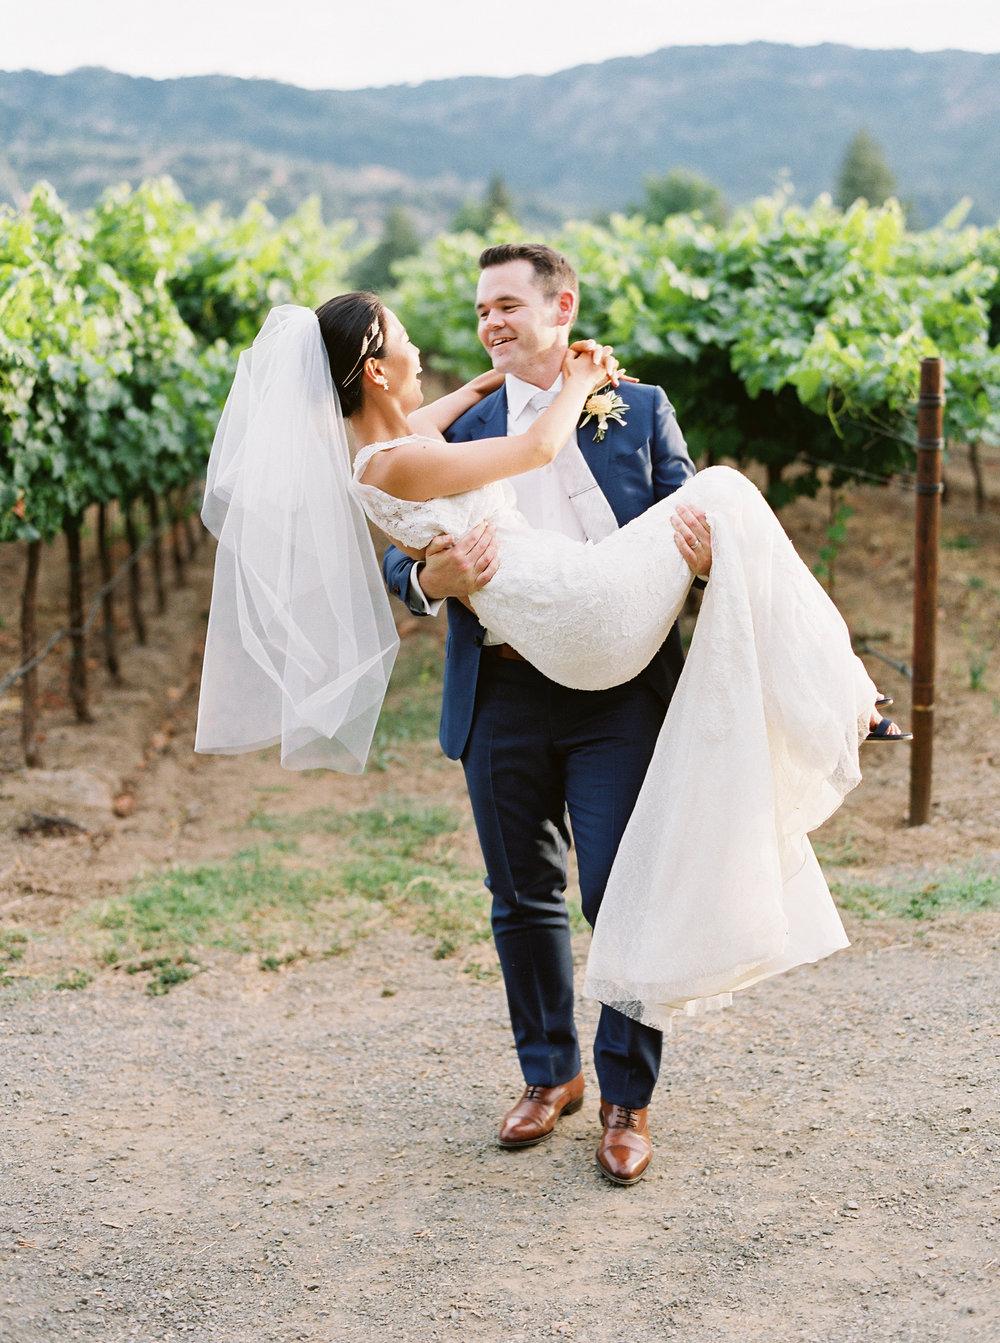 Harvest-inn-wedding-in-napa-california-14.jpg